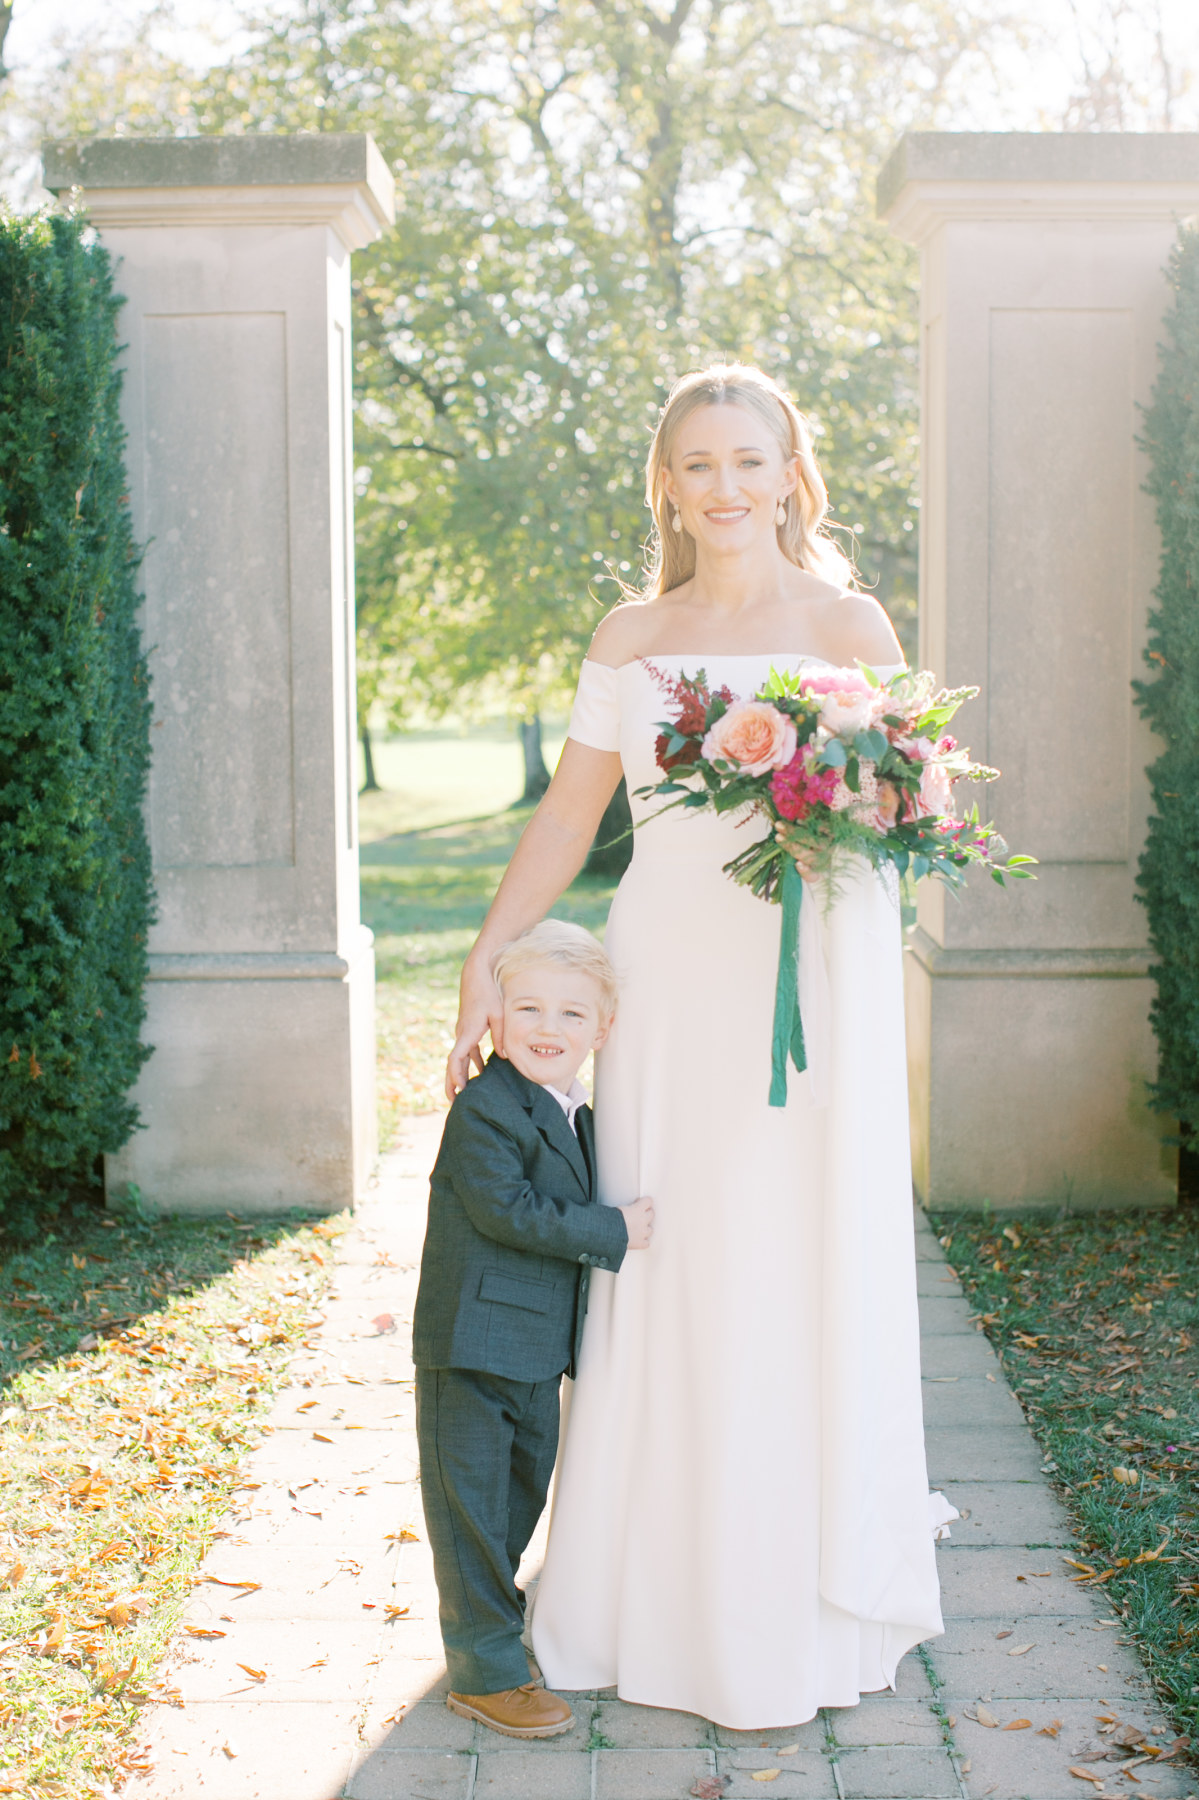 60Great_Marsh_Estate_Jillian_Justin_Wedding_AstridPhotography_AnneKelleyEventsAP_02020